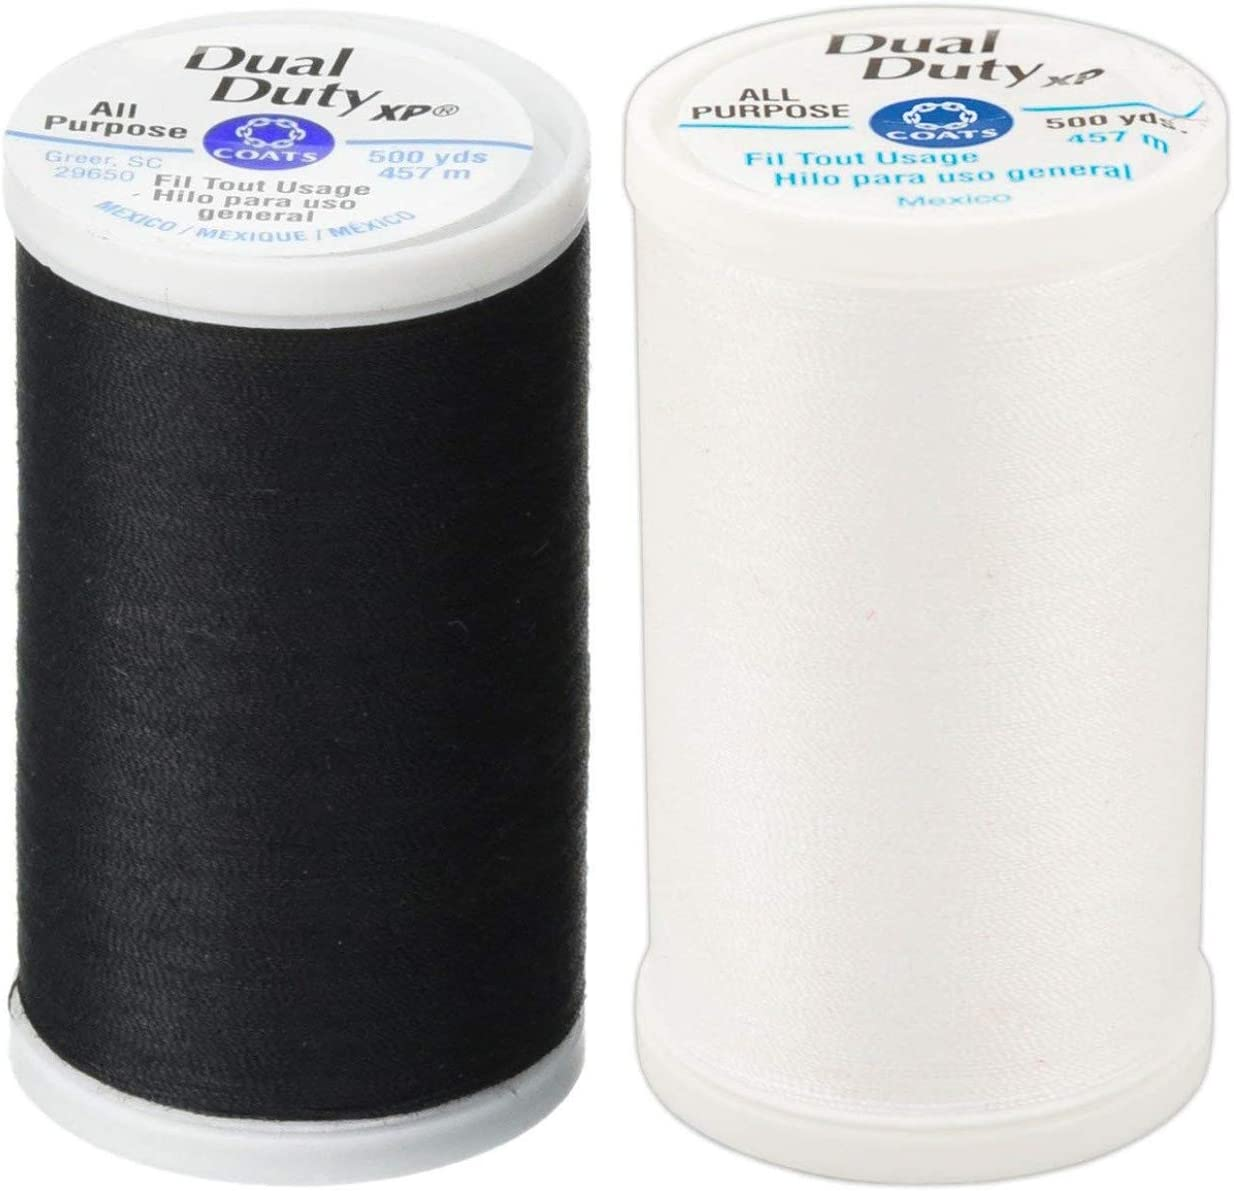 Coats /& Clark Dual Duty All-Purpose Thread BLACK /& WHITE One 400 Yard Spool each of BLACK /& White 2-Pack